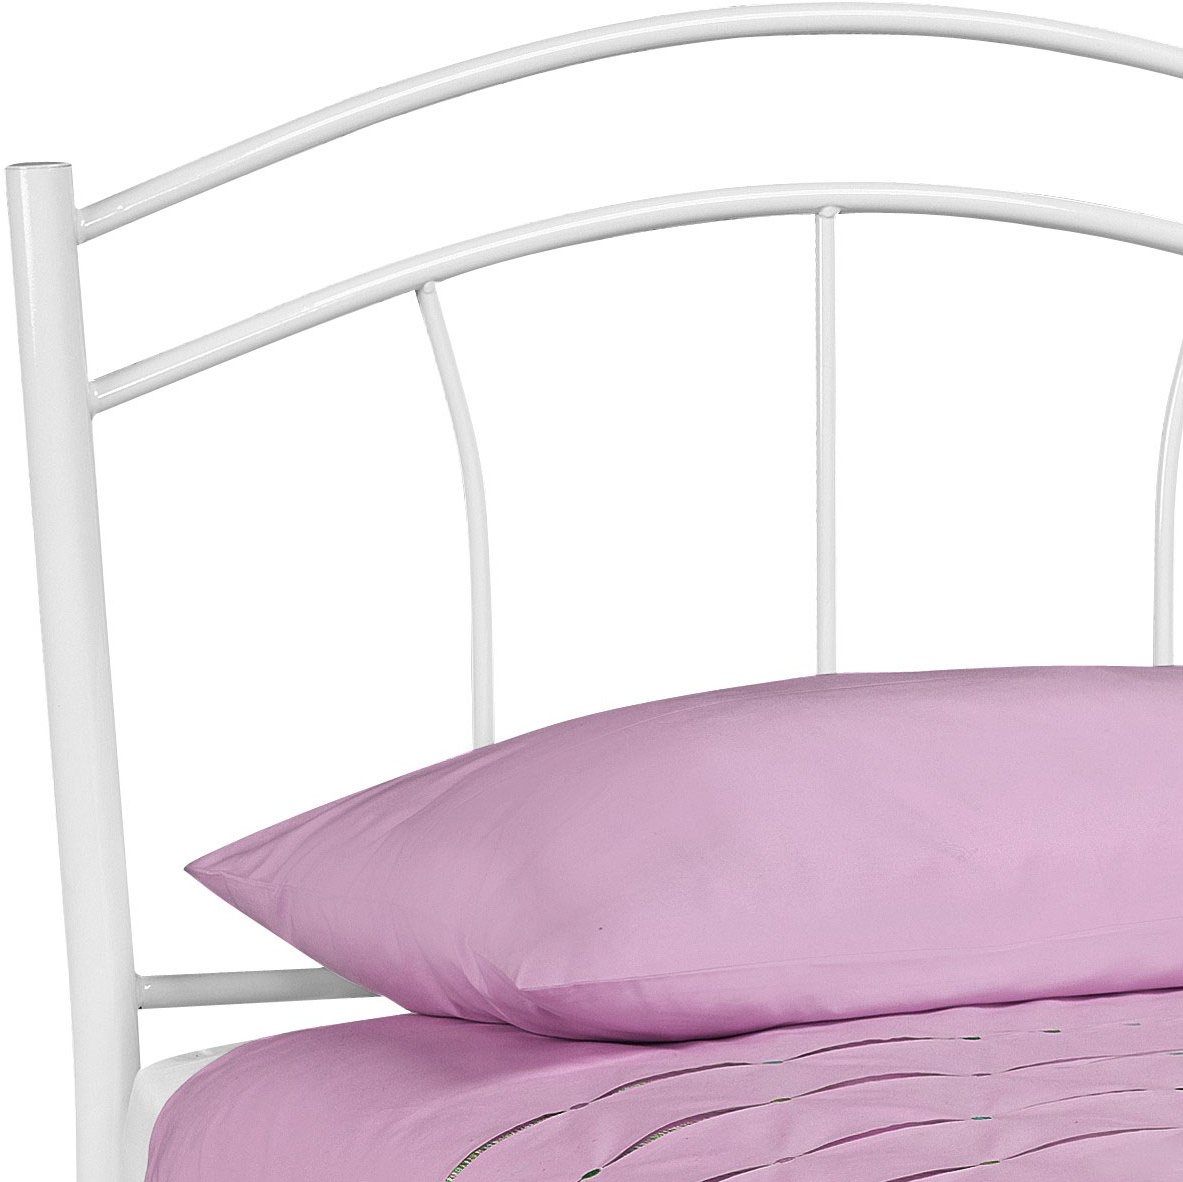 Julian Bowen Mia001 Mat010 Miah High Gloss White Bed Frame